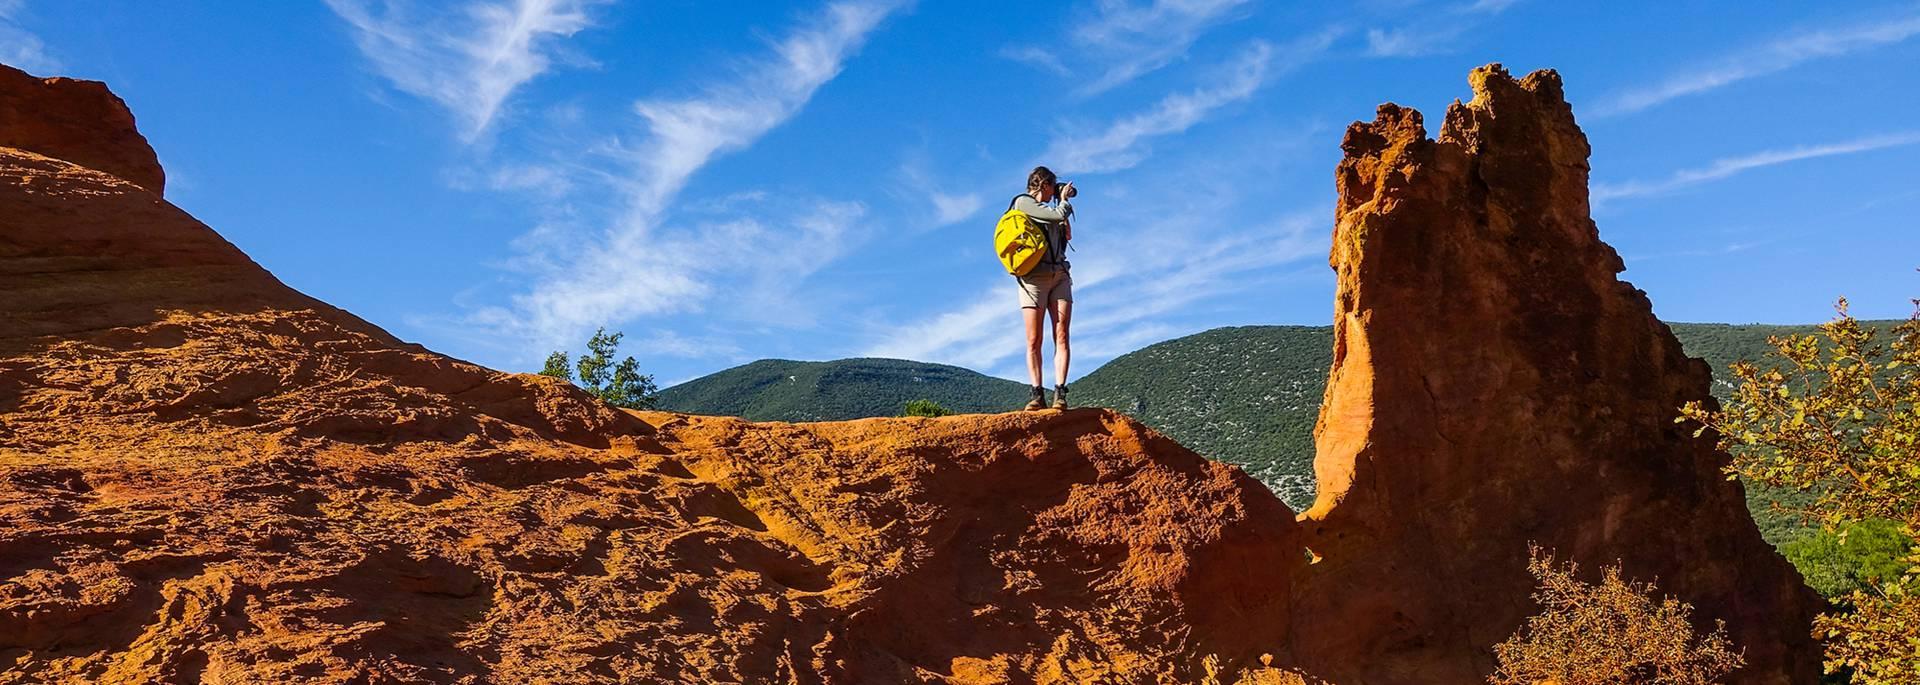 Colorado Provençal de Rustrel | Rustrel | Ocres | Ocres du Luberon